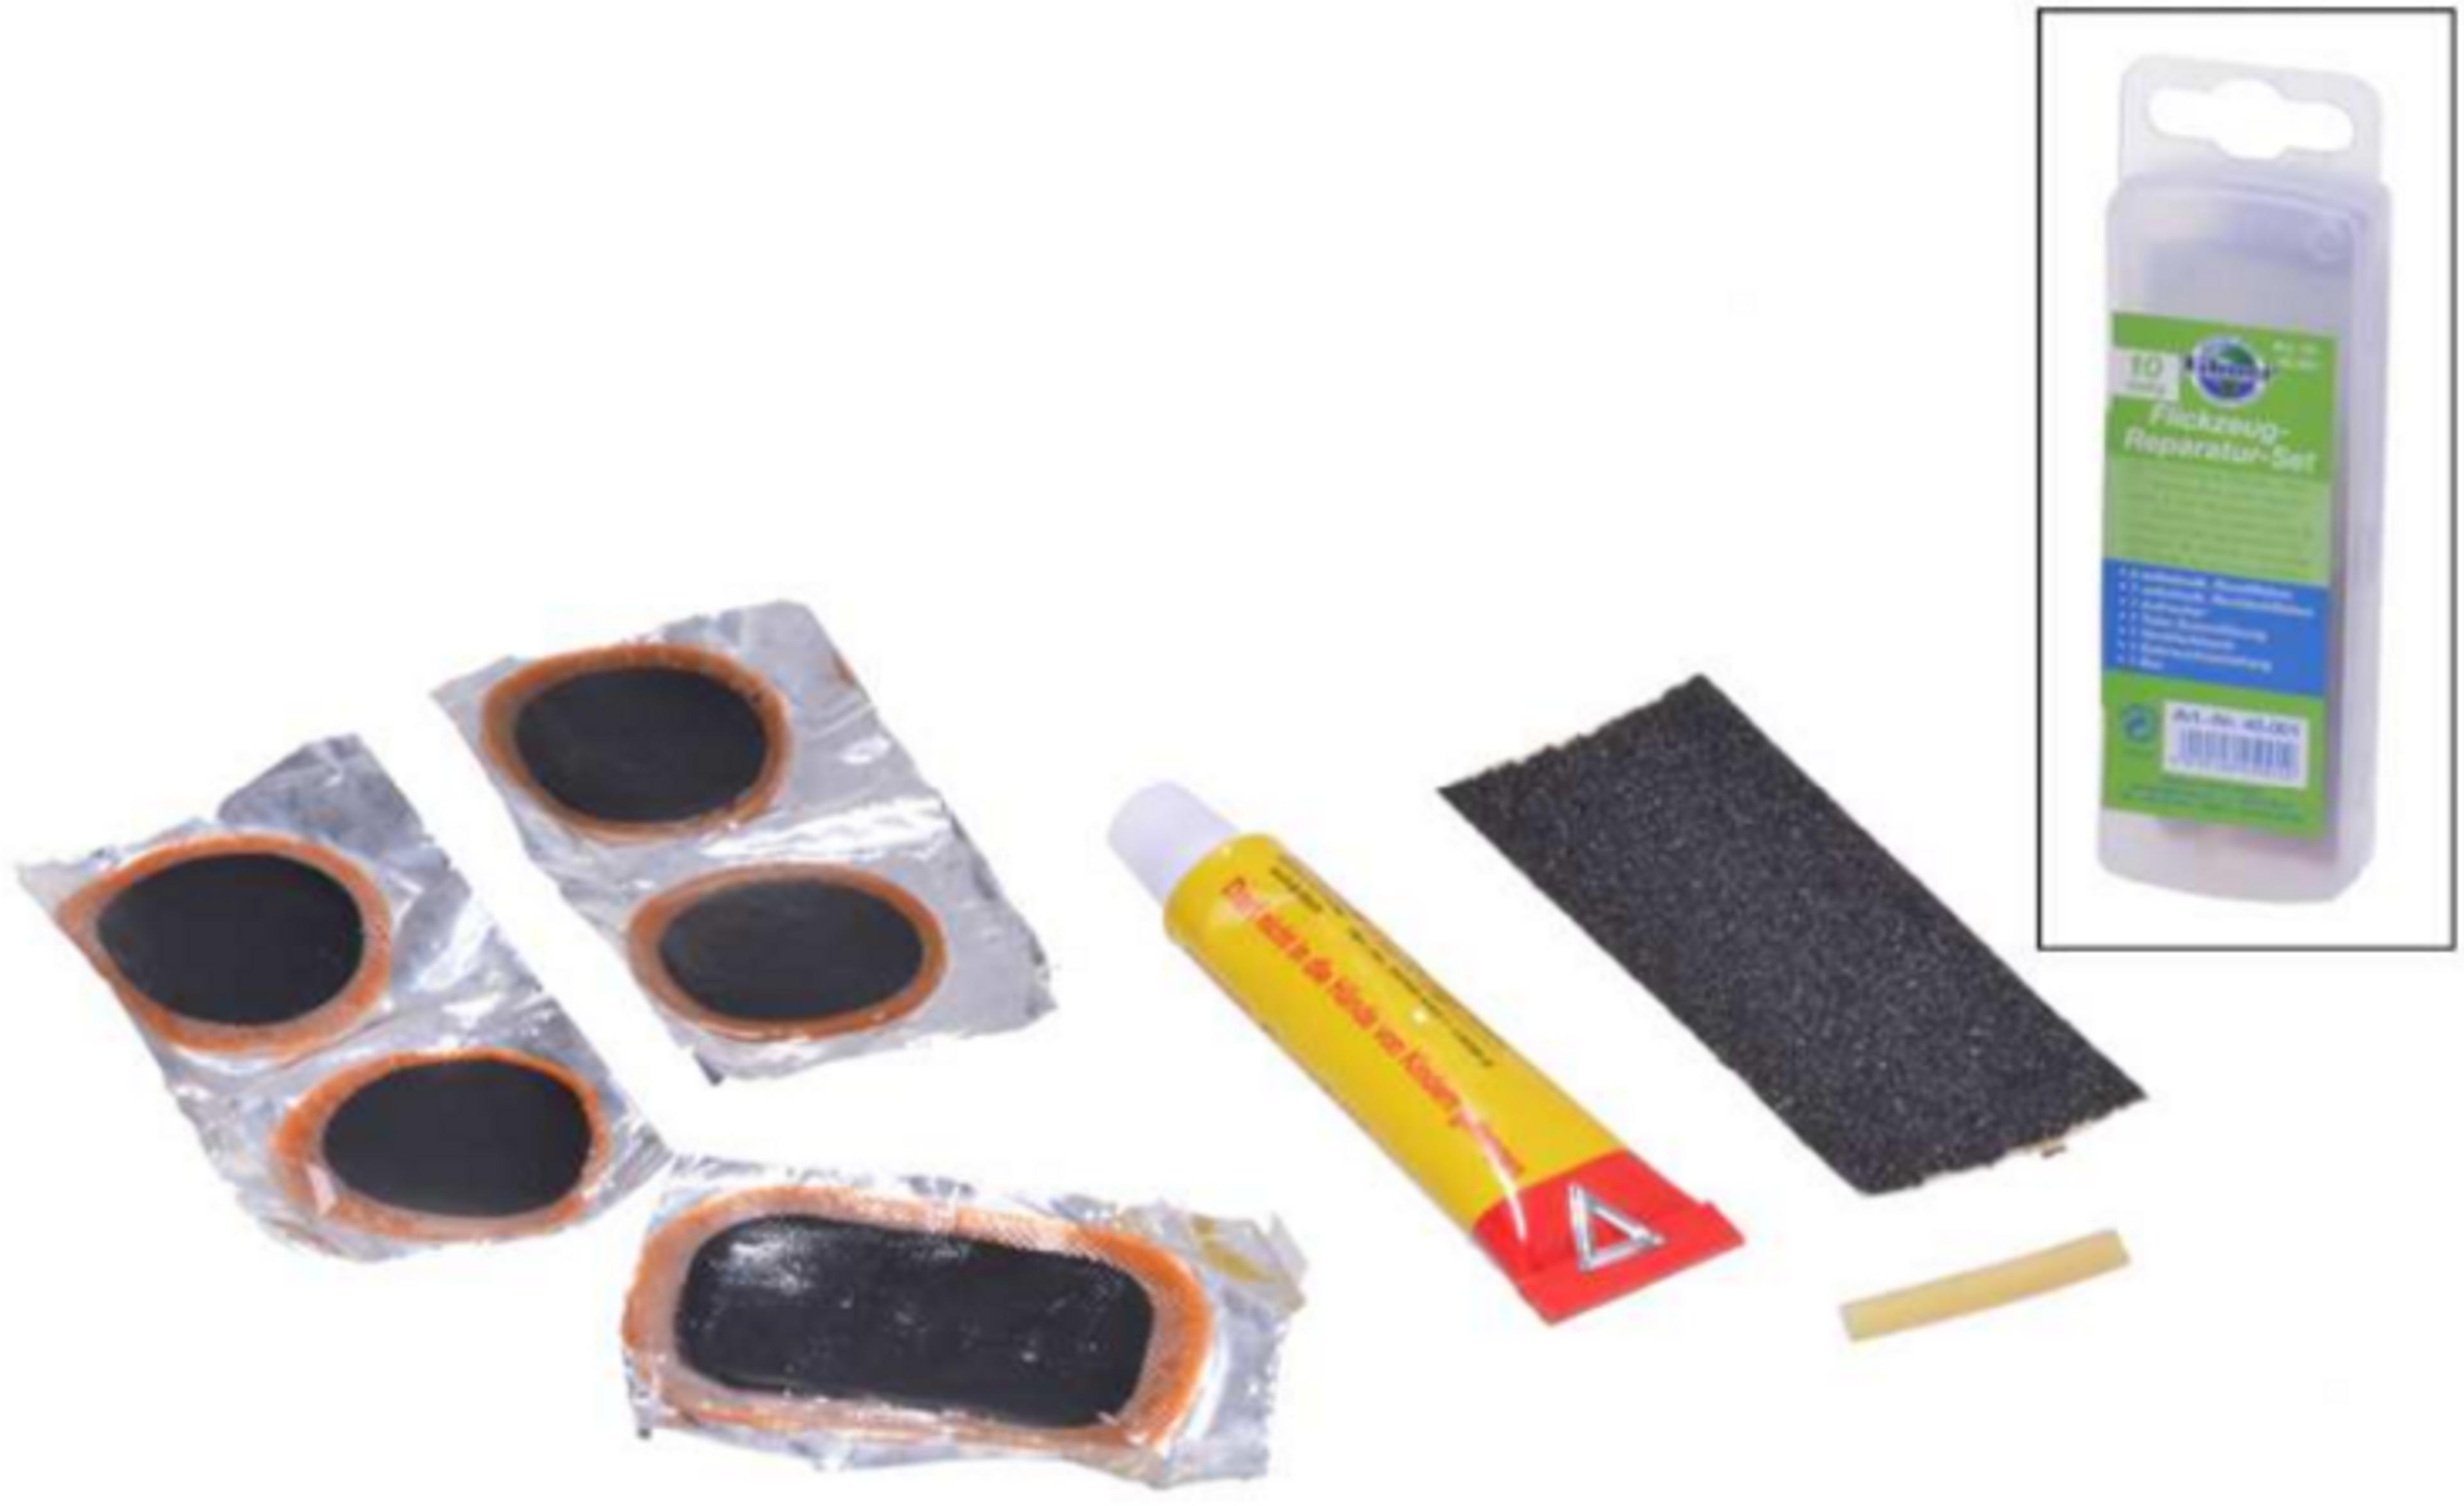 fahrrad set reparatur flickzeug f r reifen 10 teilig. Black Bedroom Furniture Sets. Home Design Ideas